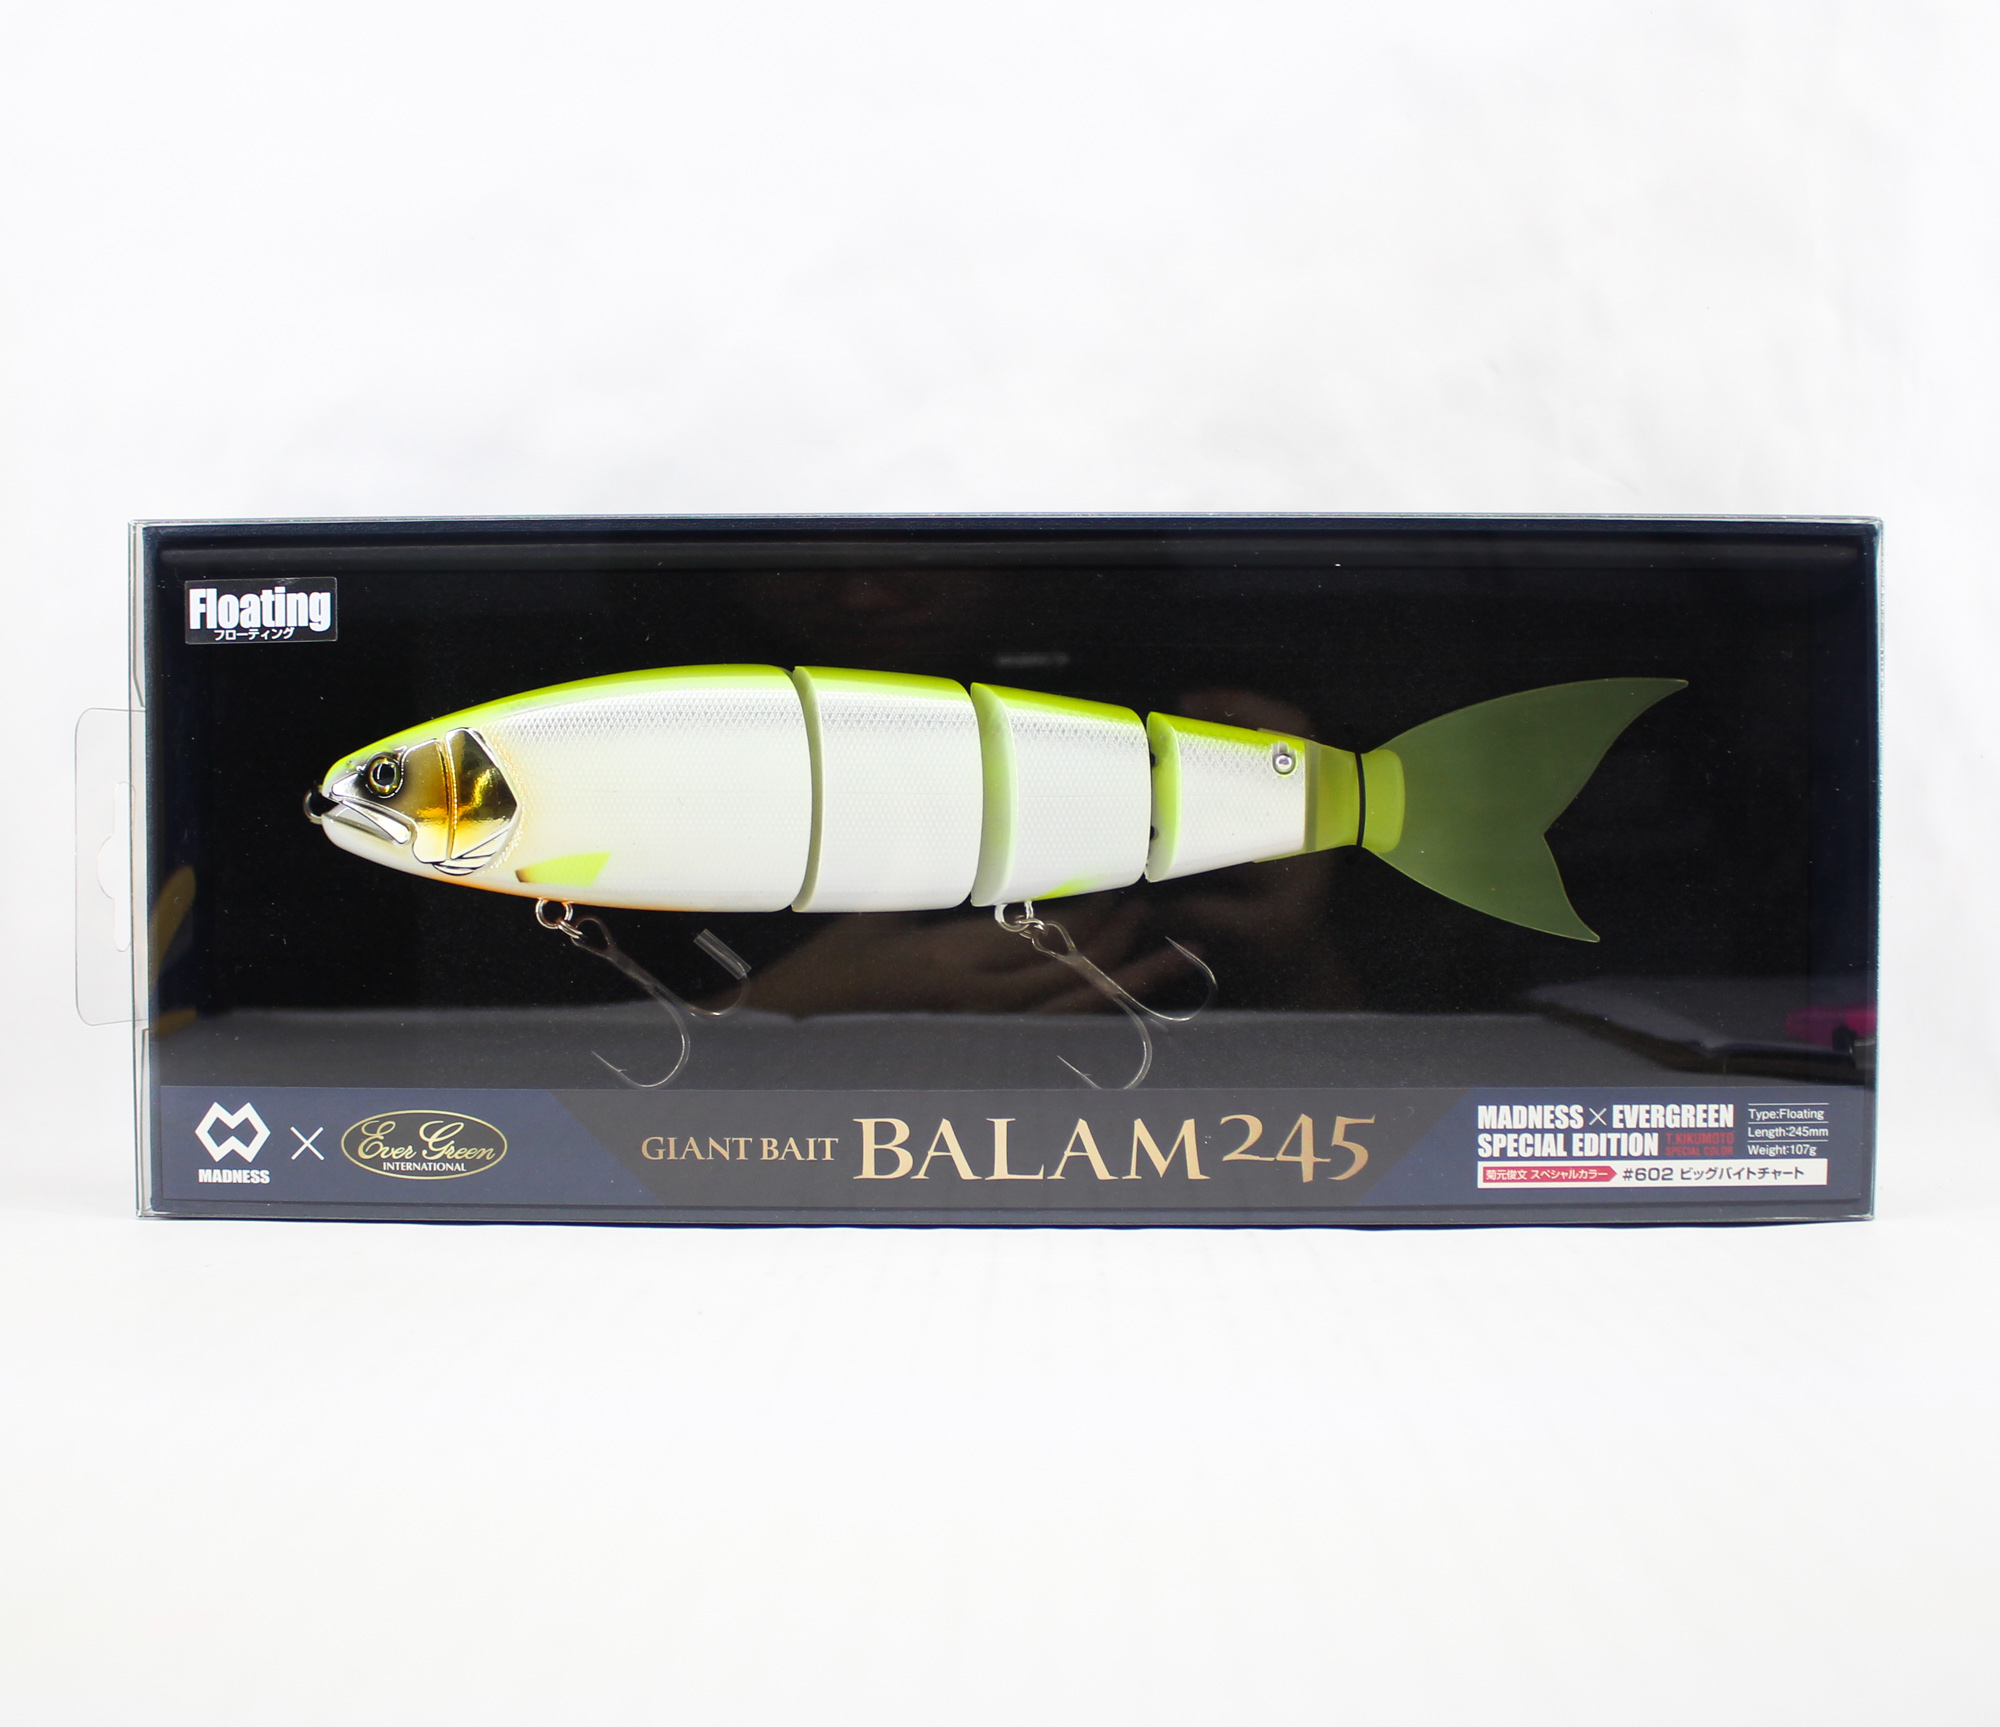 Evergreen Balam 245 Floating Lure 602 (7204)